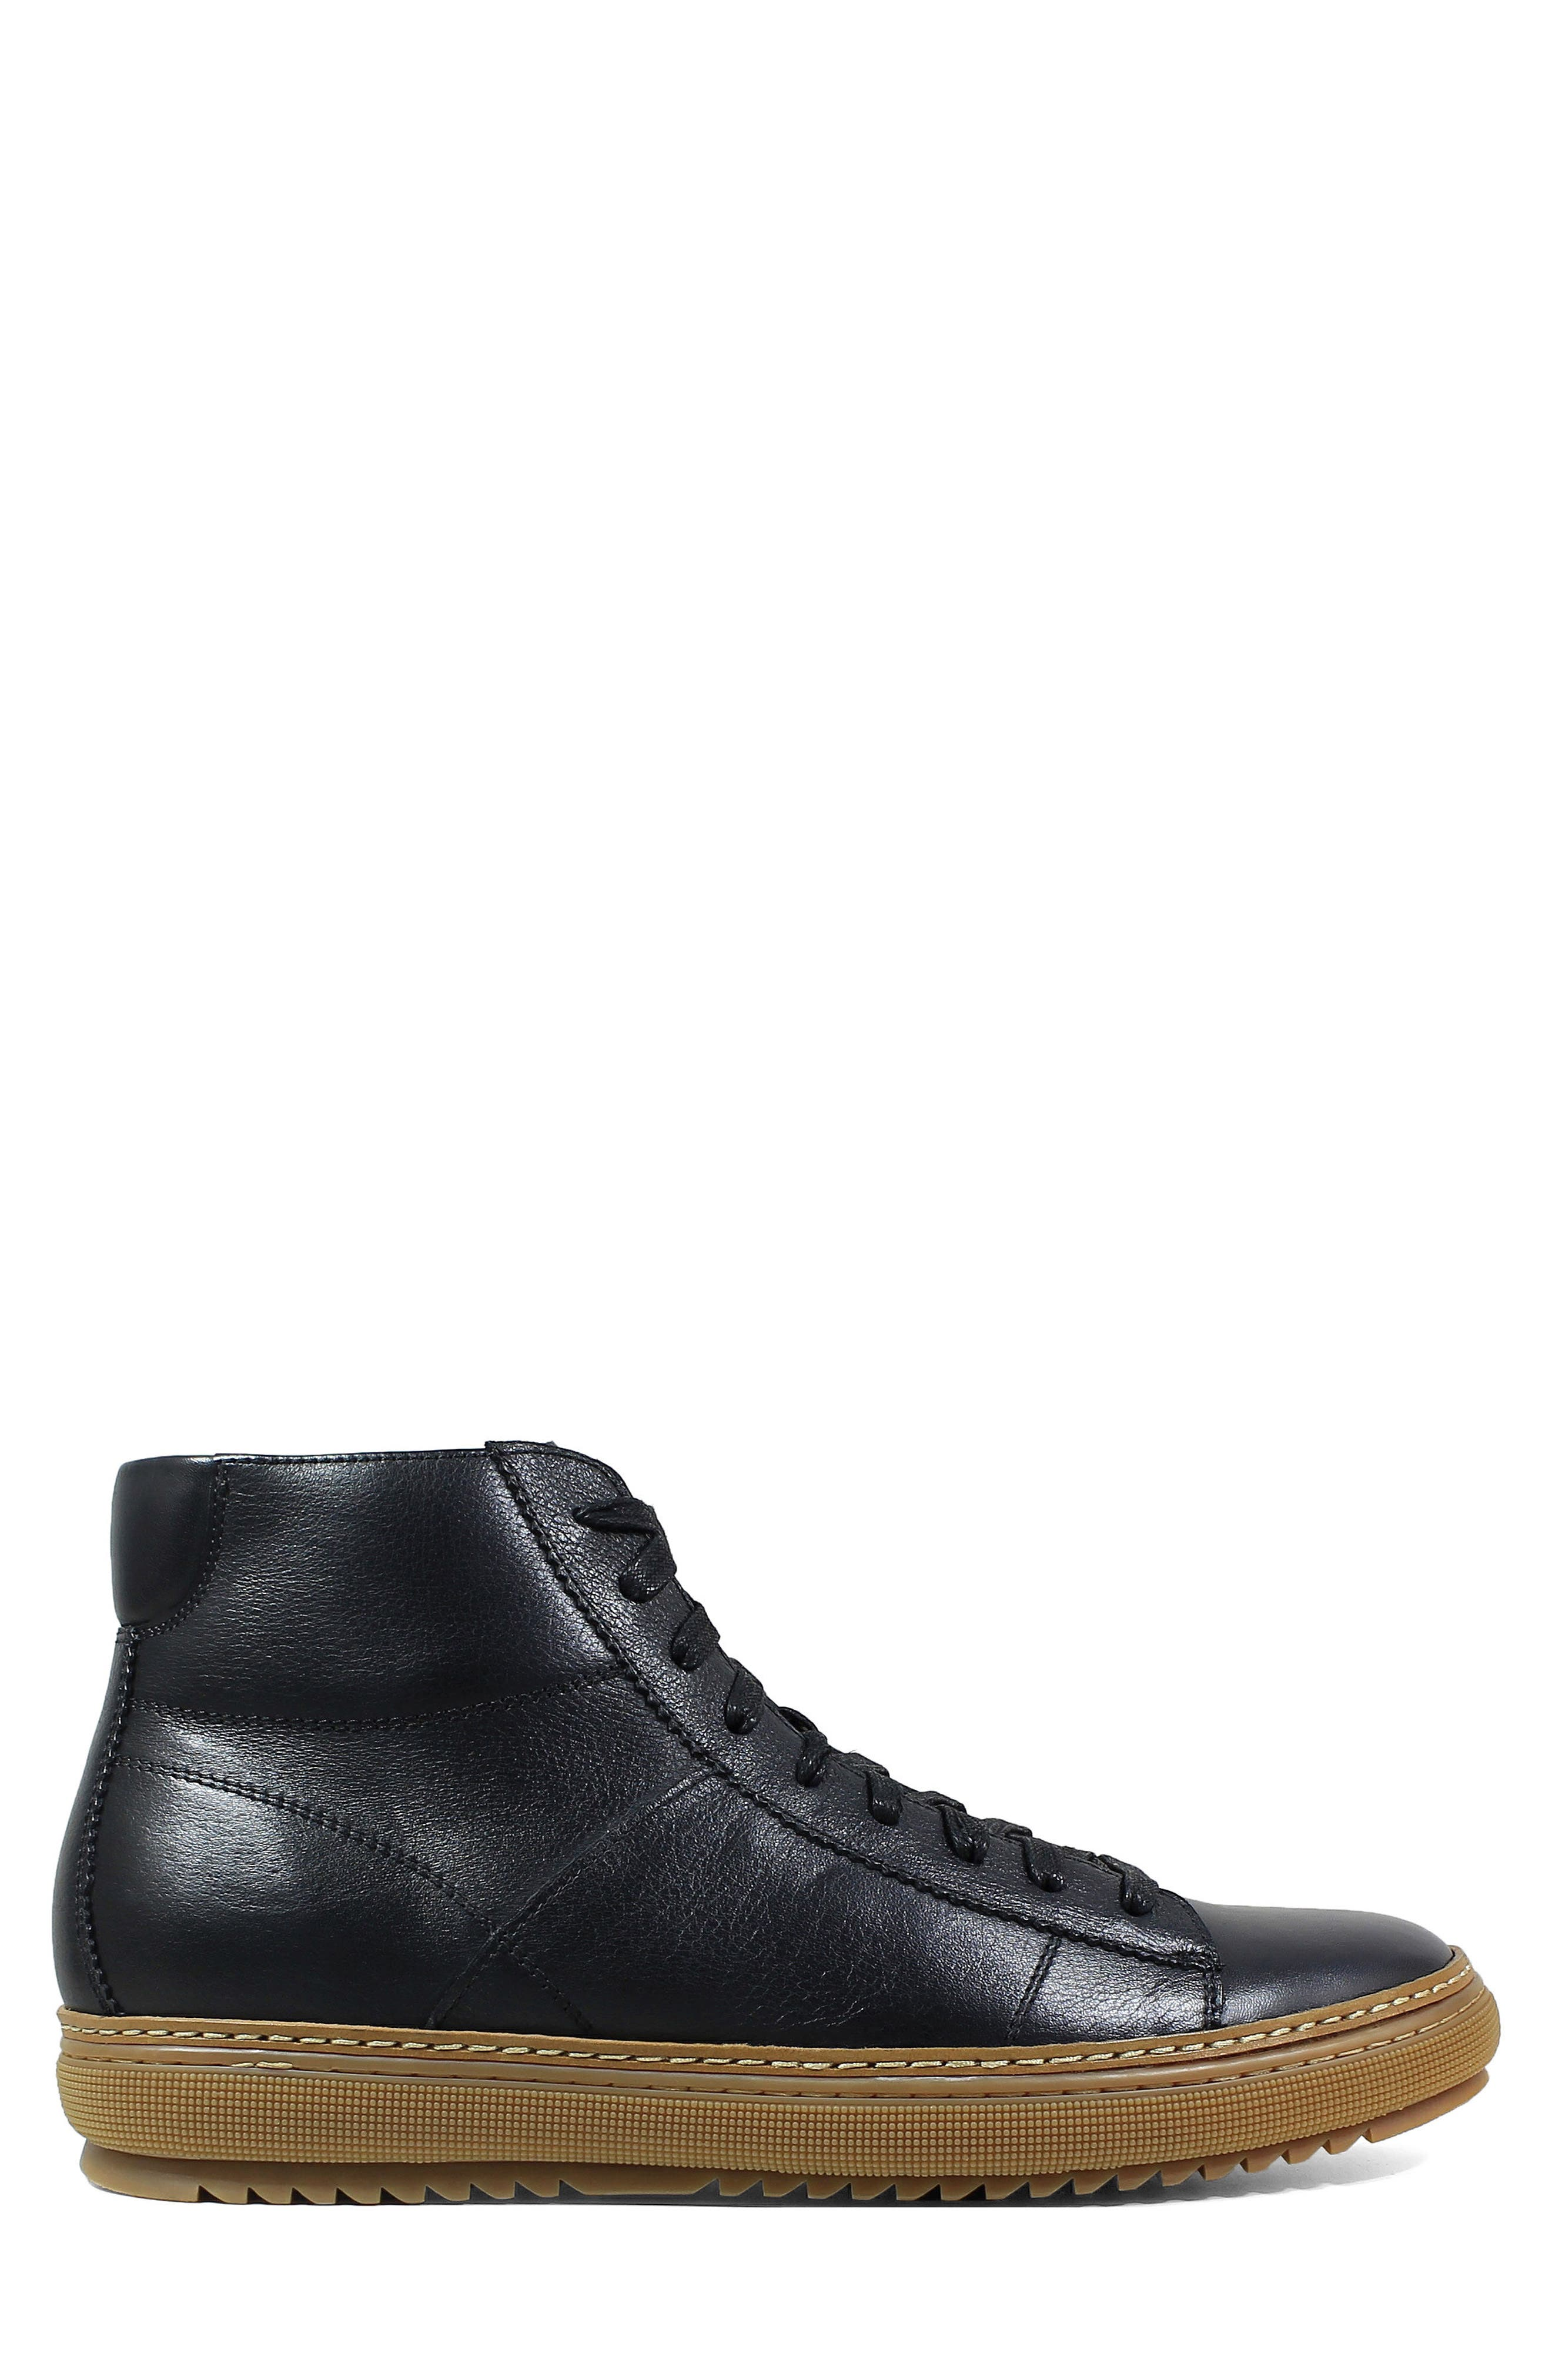 Crew Sneaker,                             Alternate thumbnail 3, color,                             Black